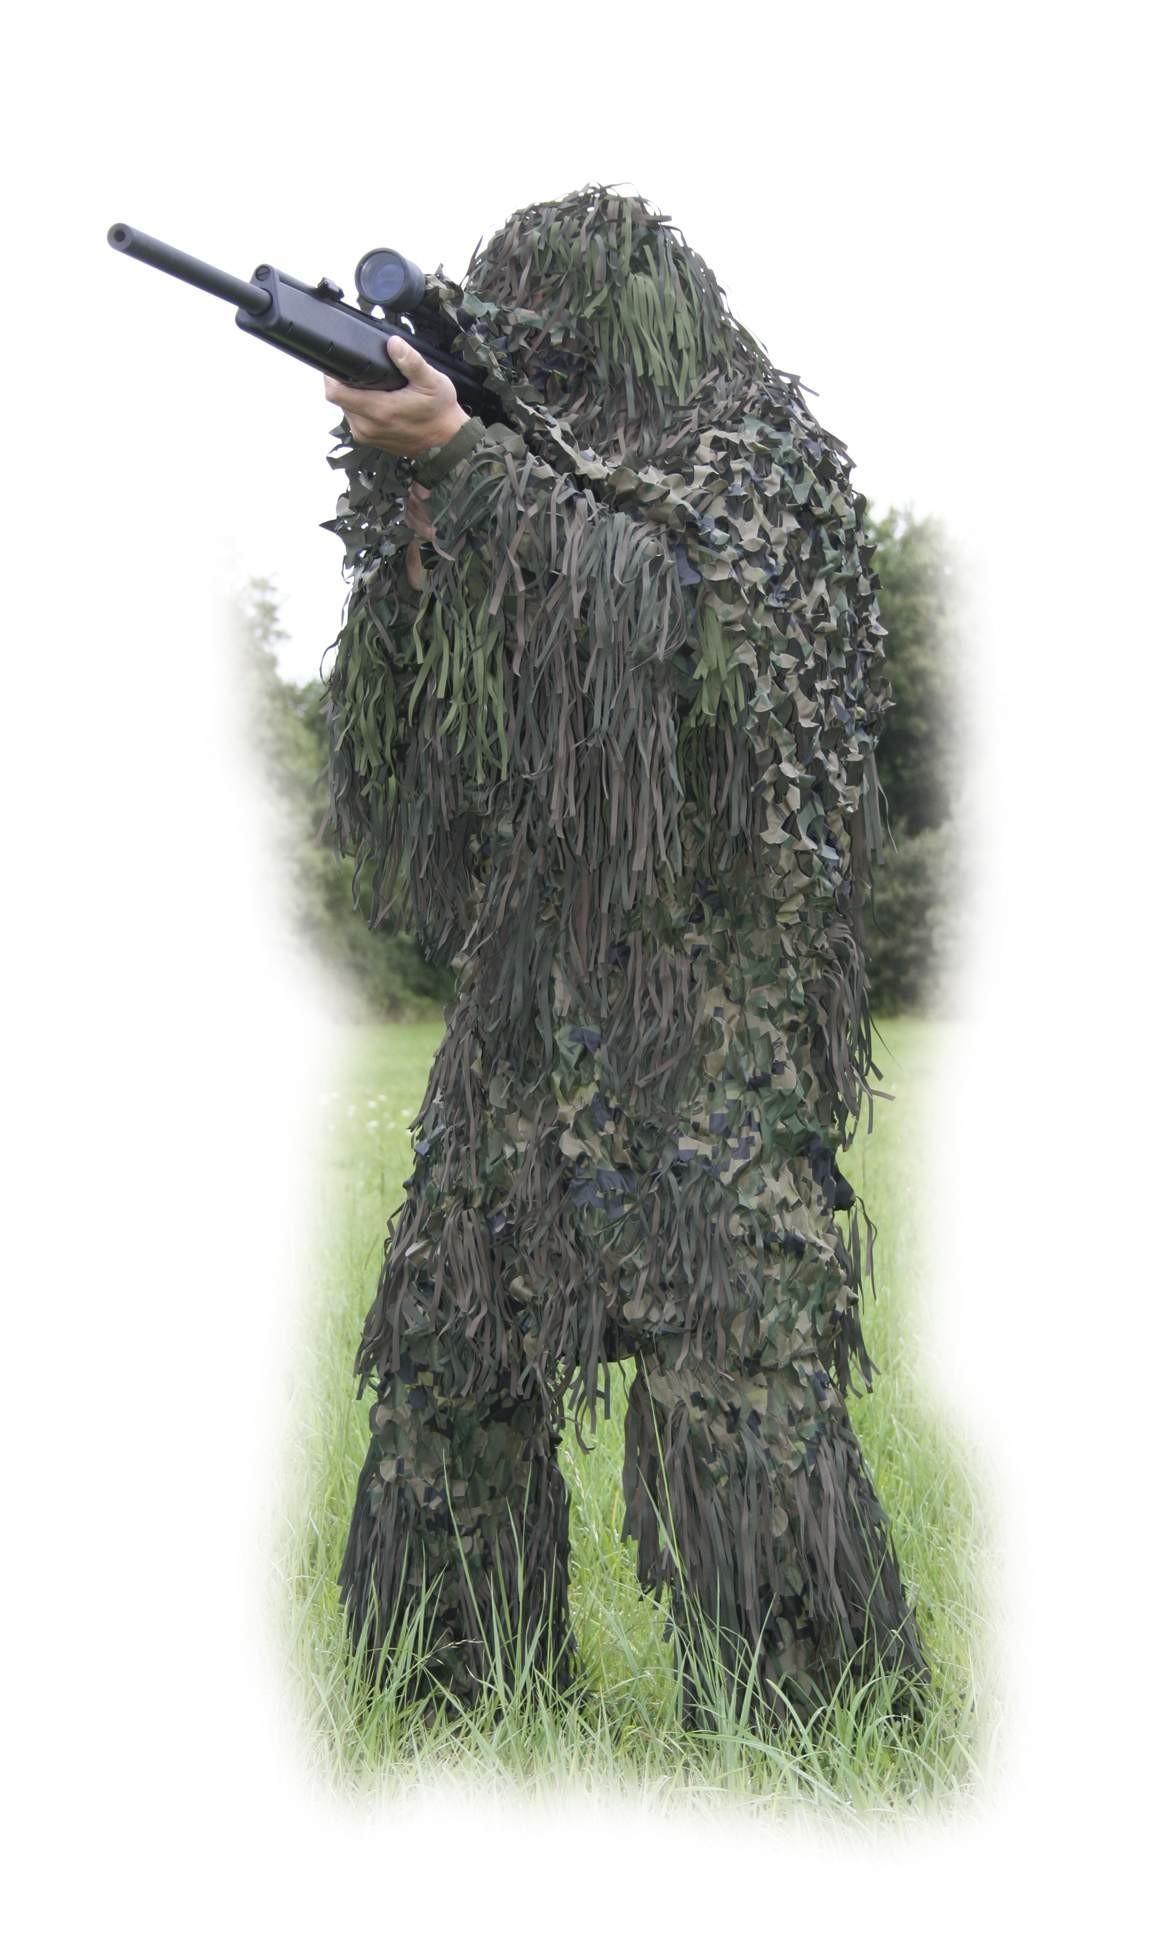 tenue compl te de camouflage ghili xl xxl abris et filets de camouflage made in chasse. Black Bedroom Furniture Sets. Home Design Ideas